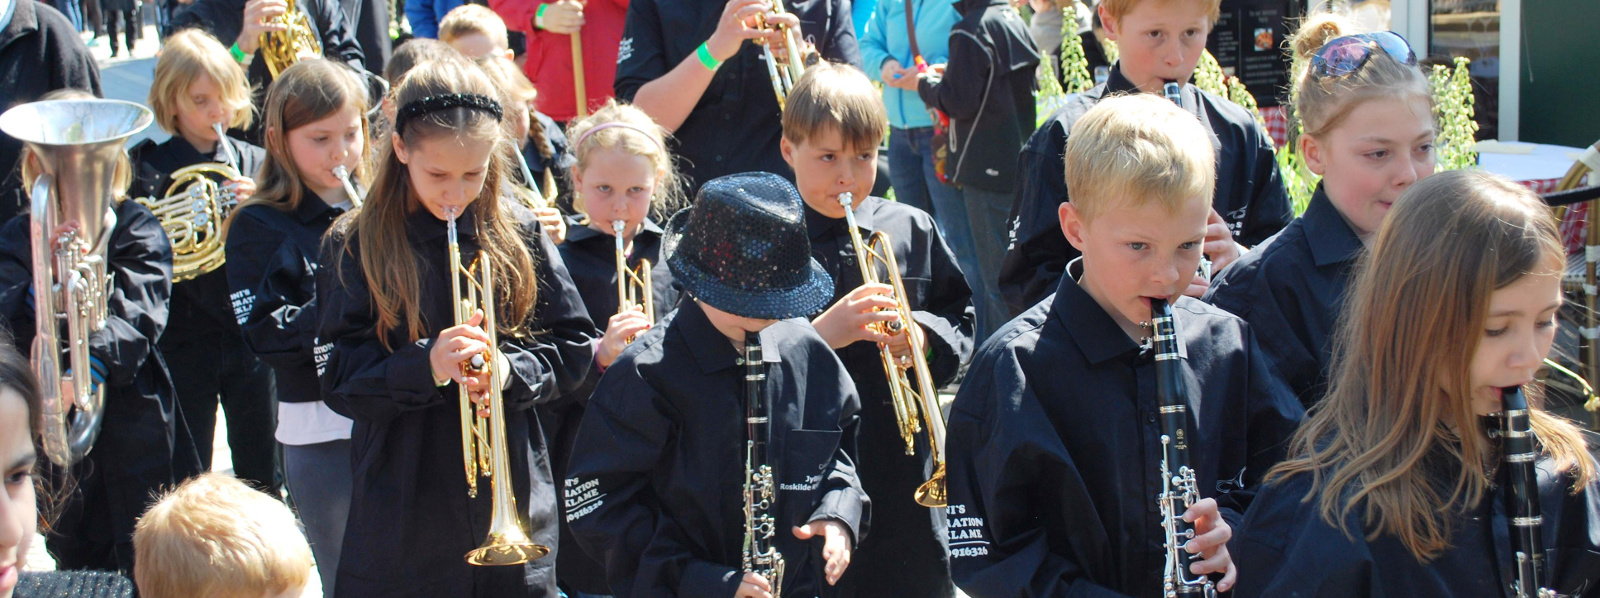 skoleorkestret.dk